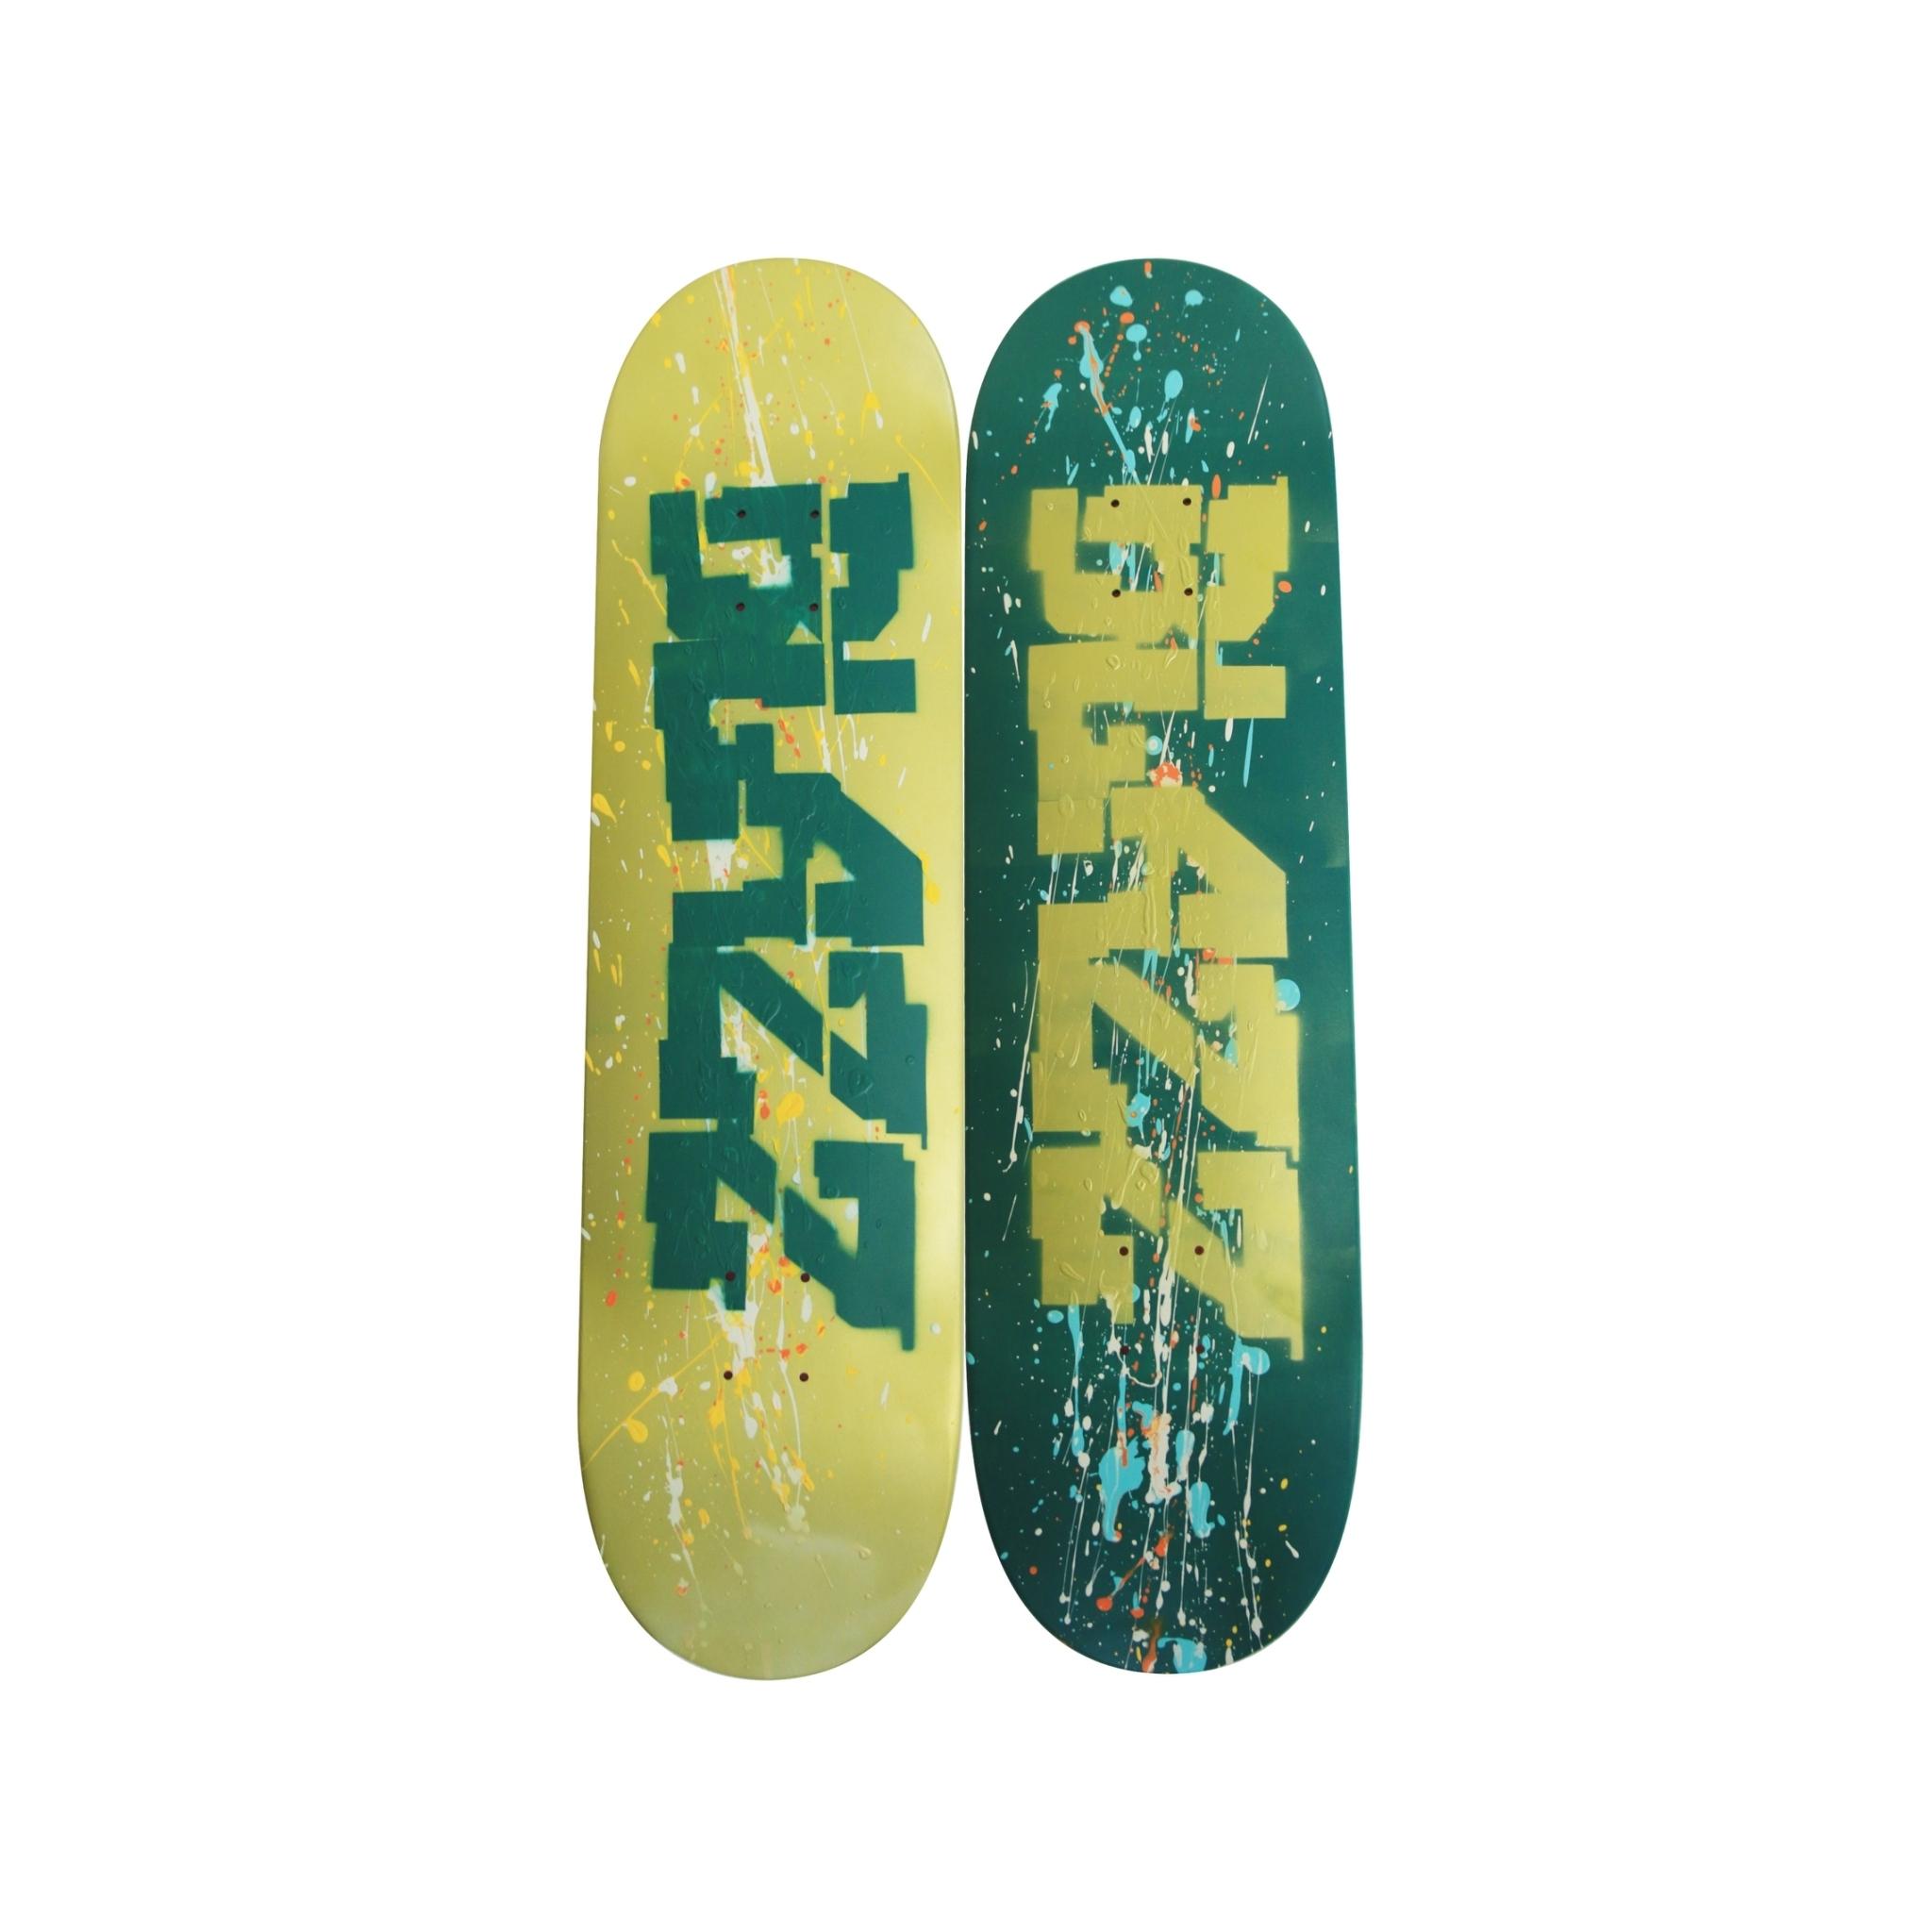 ZZSB ARTSESSION05 DECK03 (8.25) [GOLD/GREEN]